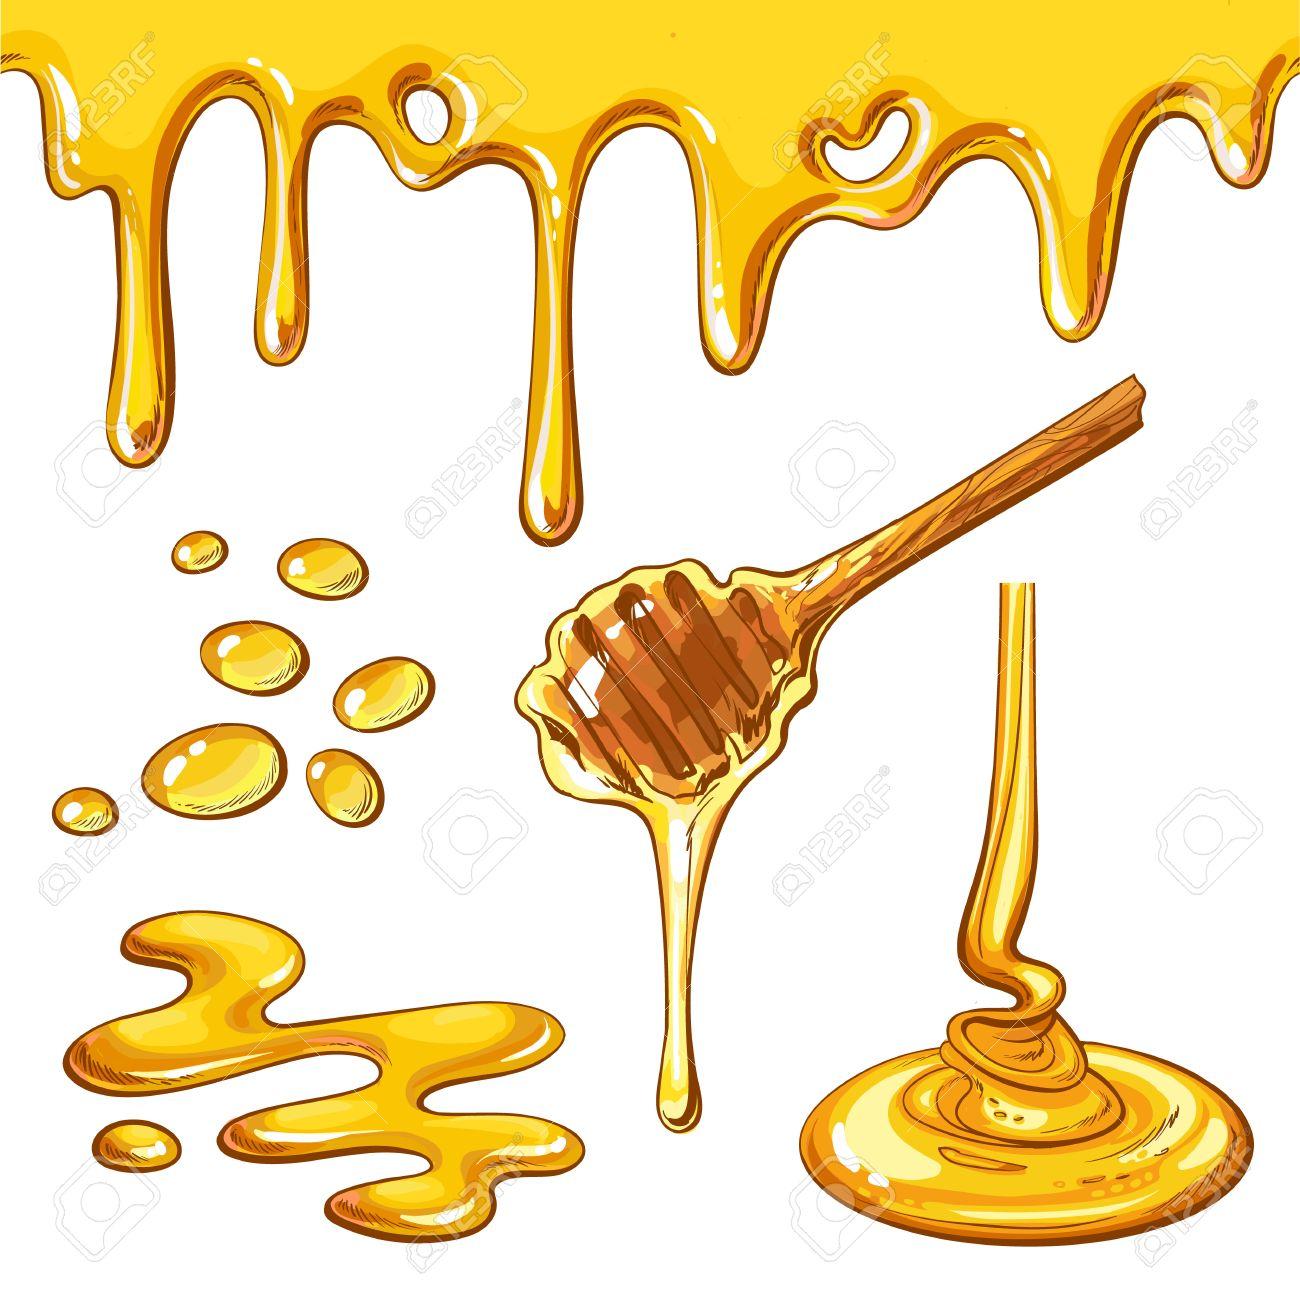 Honey Dropps naked 679